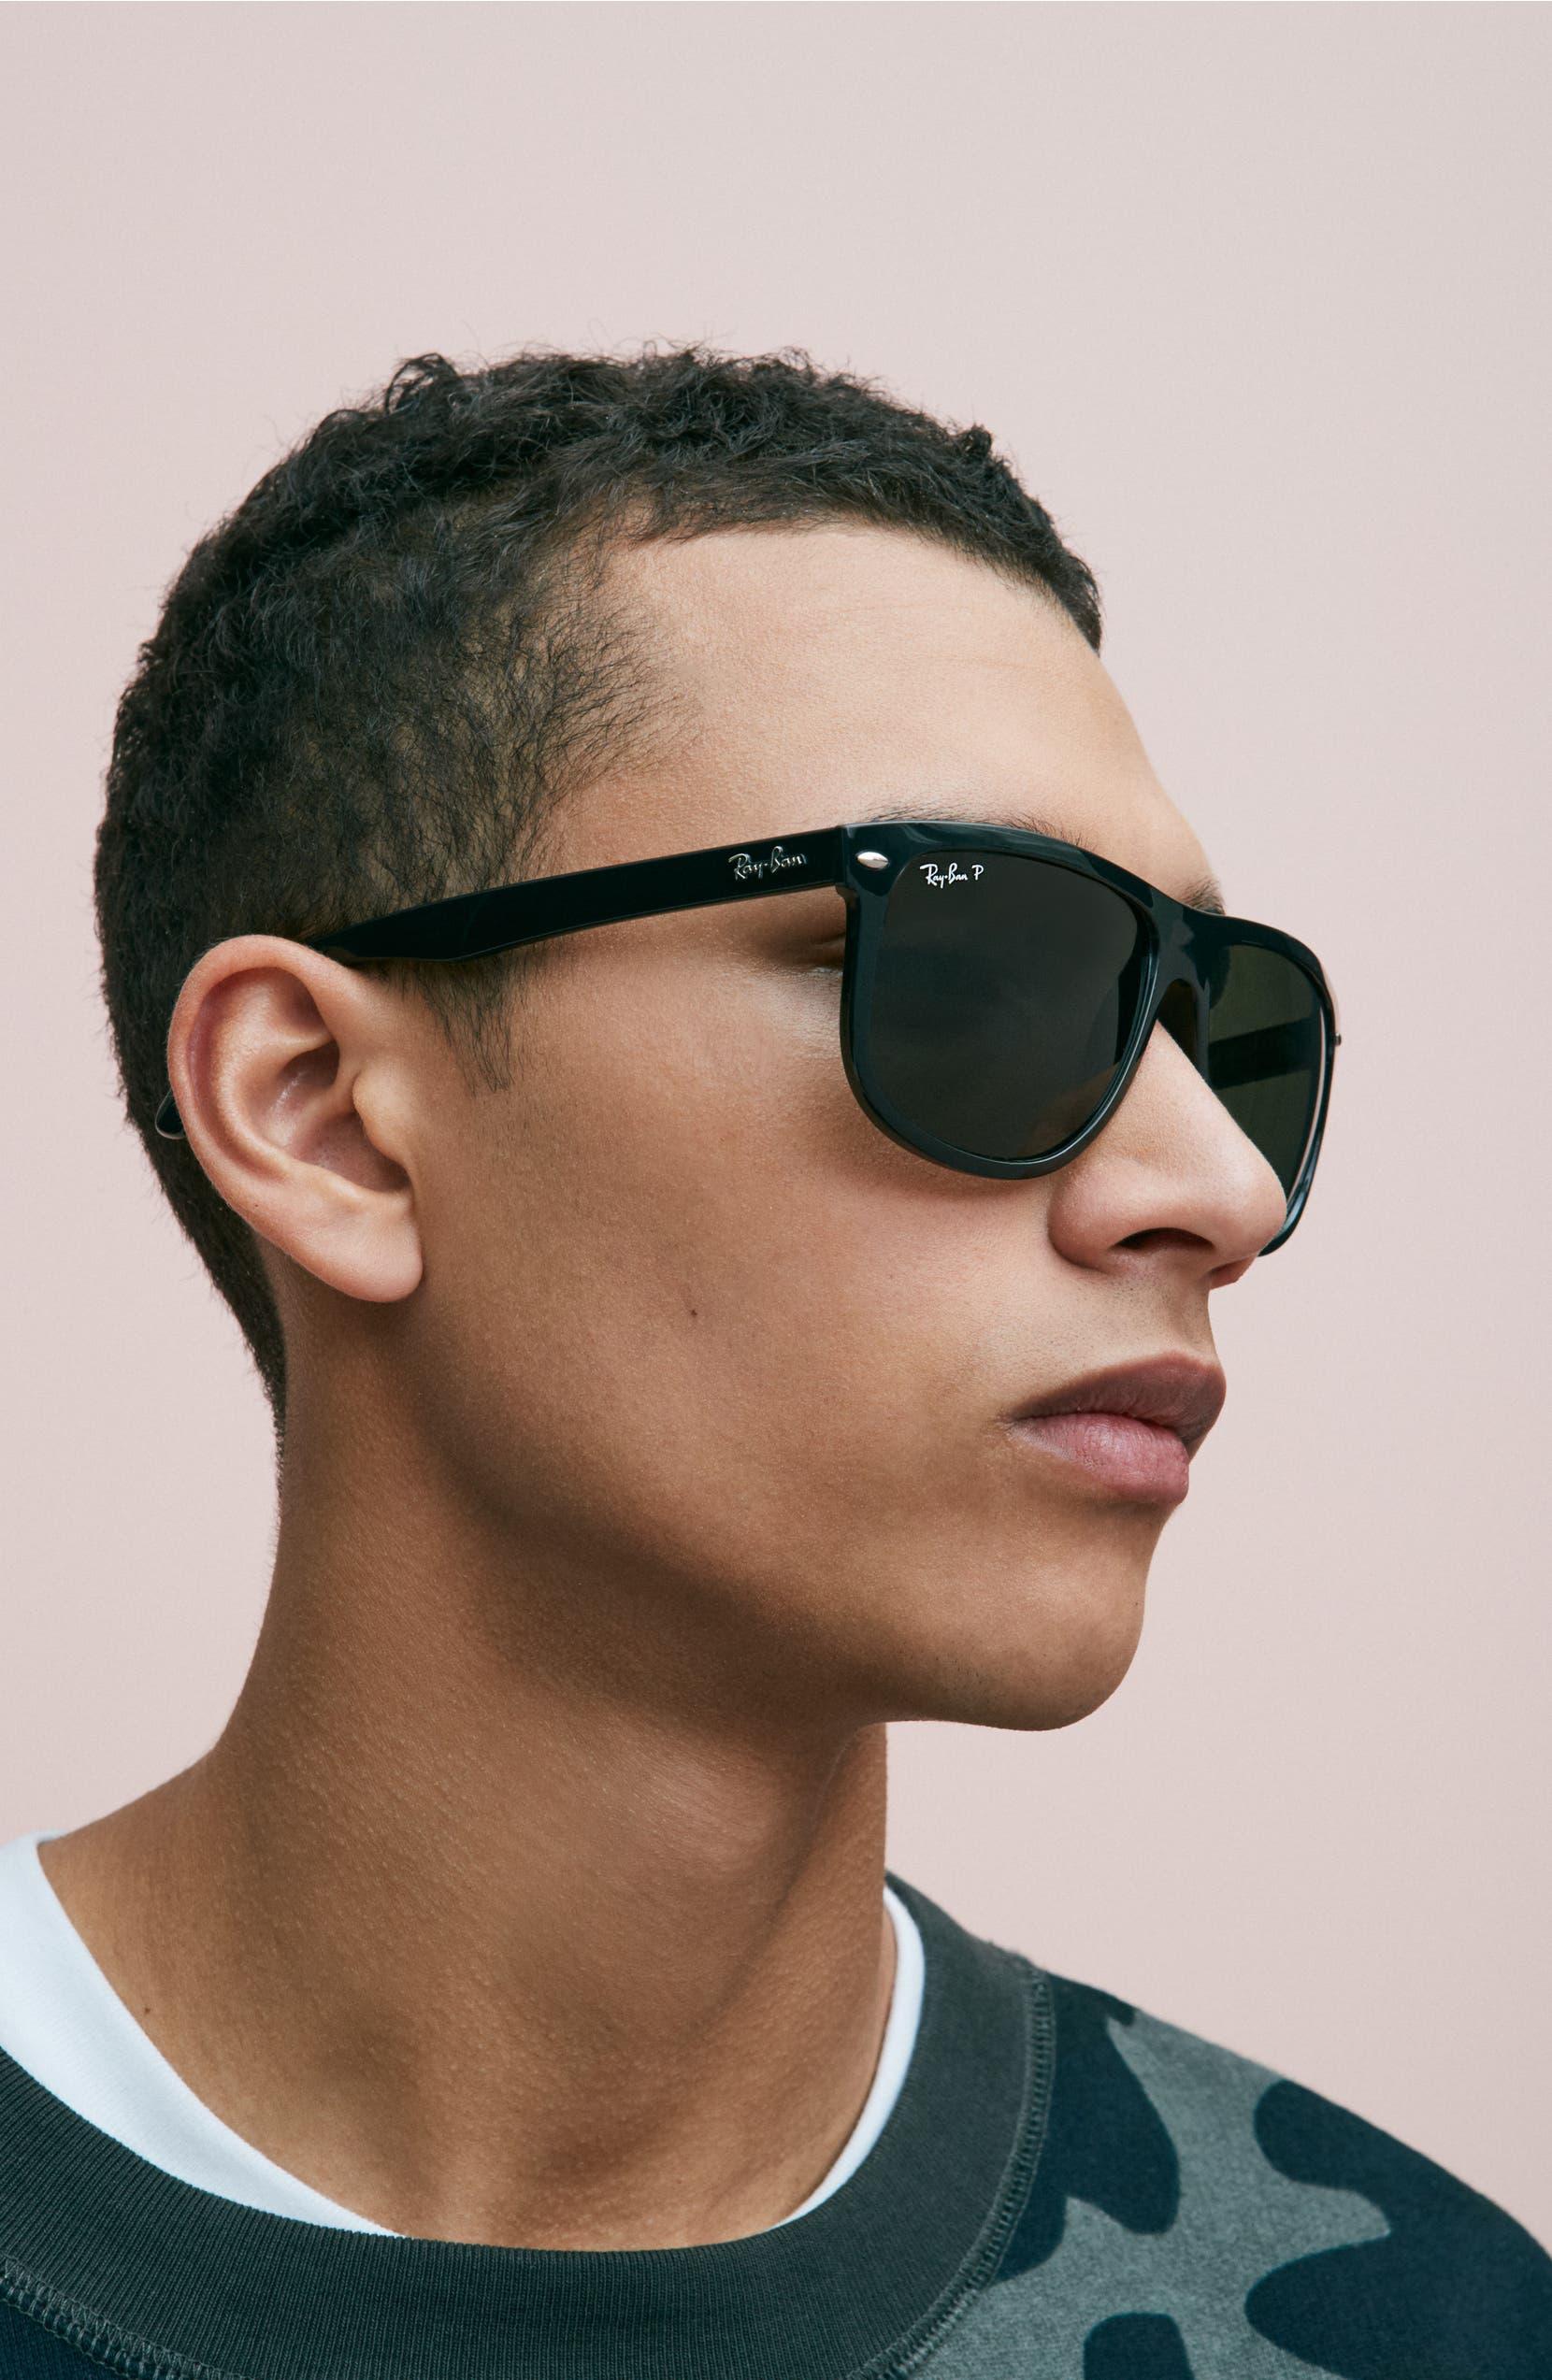 a28736d23a3 Ray-Ban  Boyfriend  60mm Polarized Sunglasses